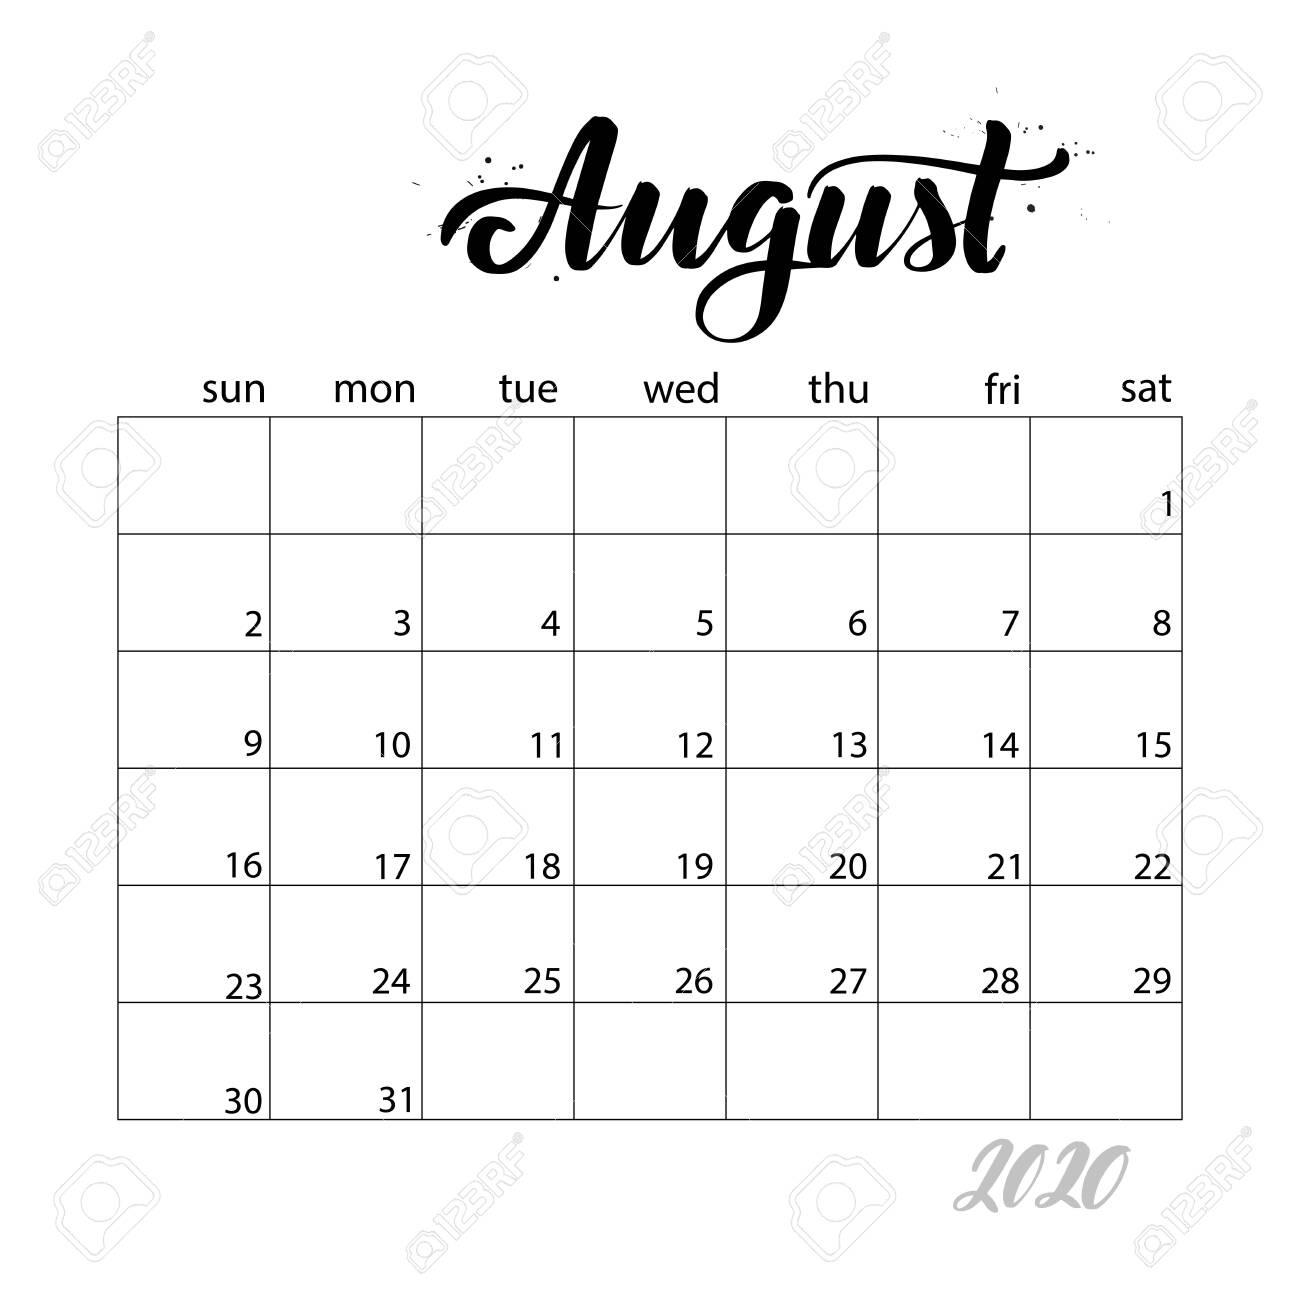 August. Monthly Calendar For 2020 Year. Handwritten Modern Calligraphy..